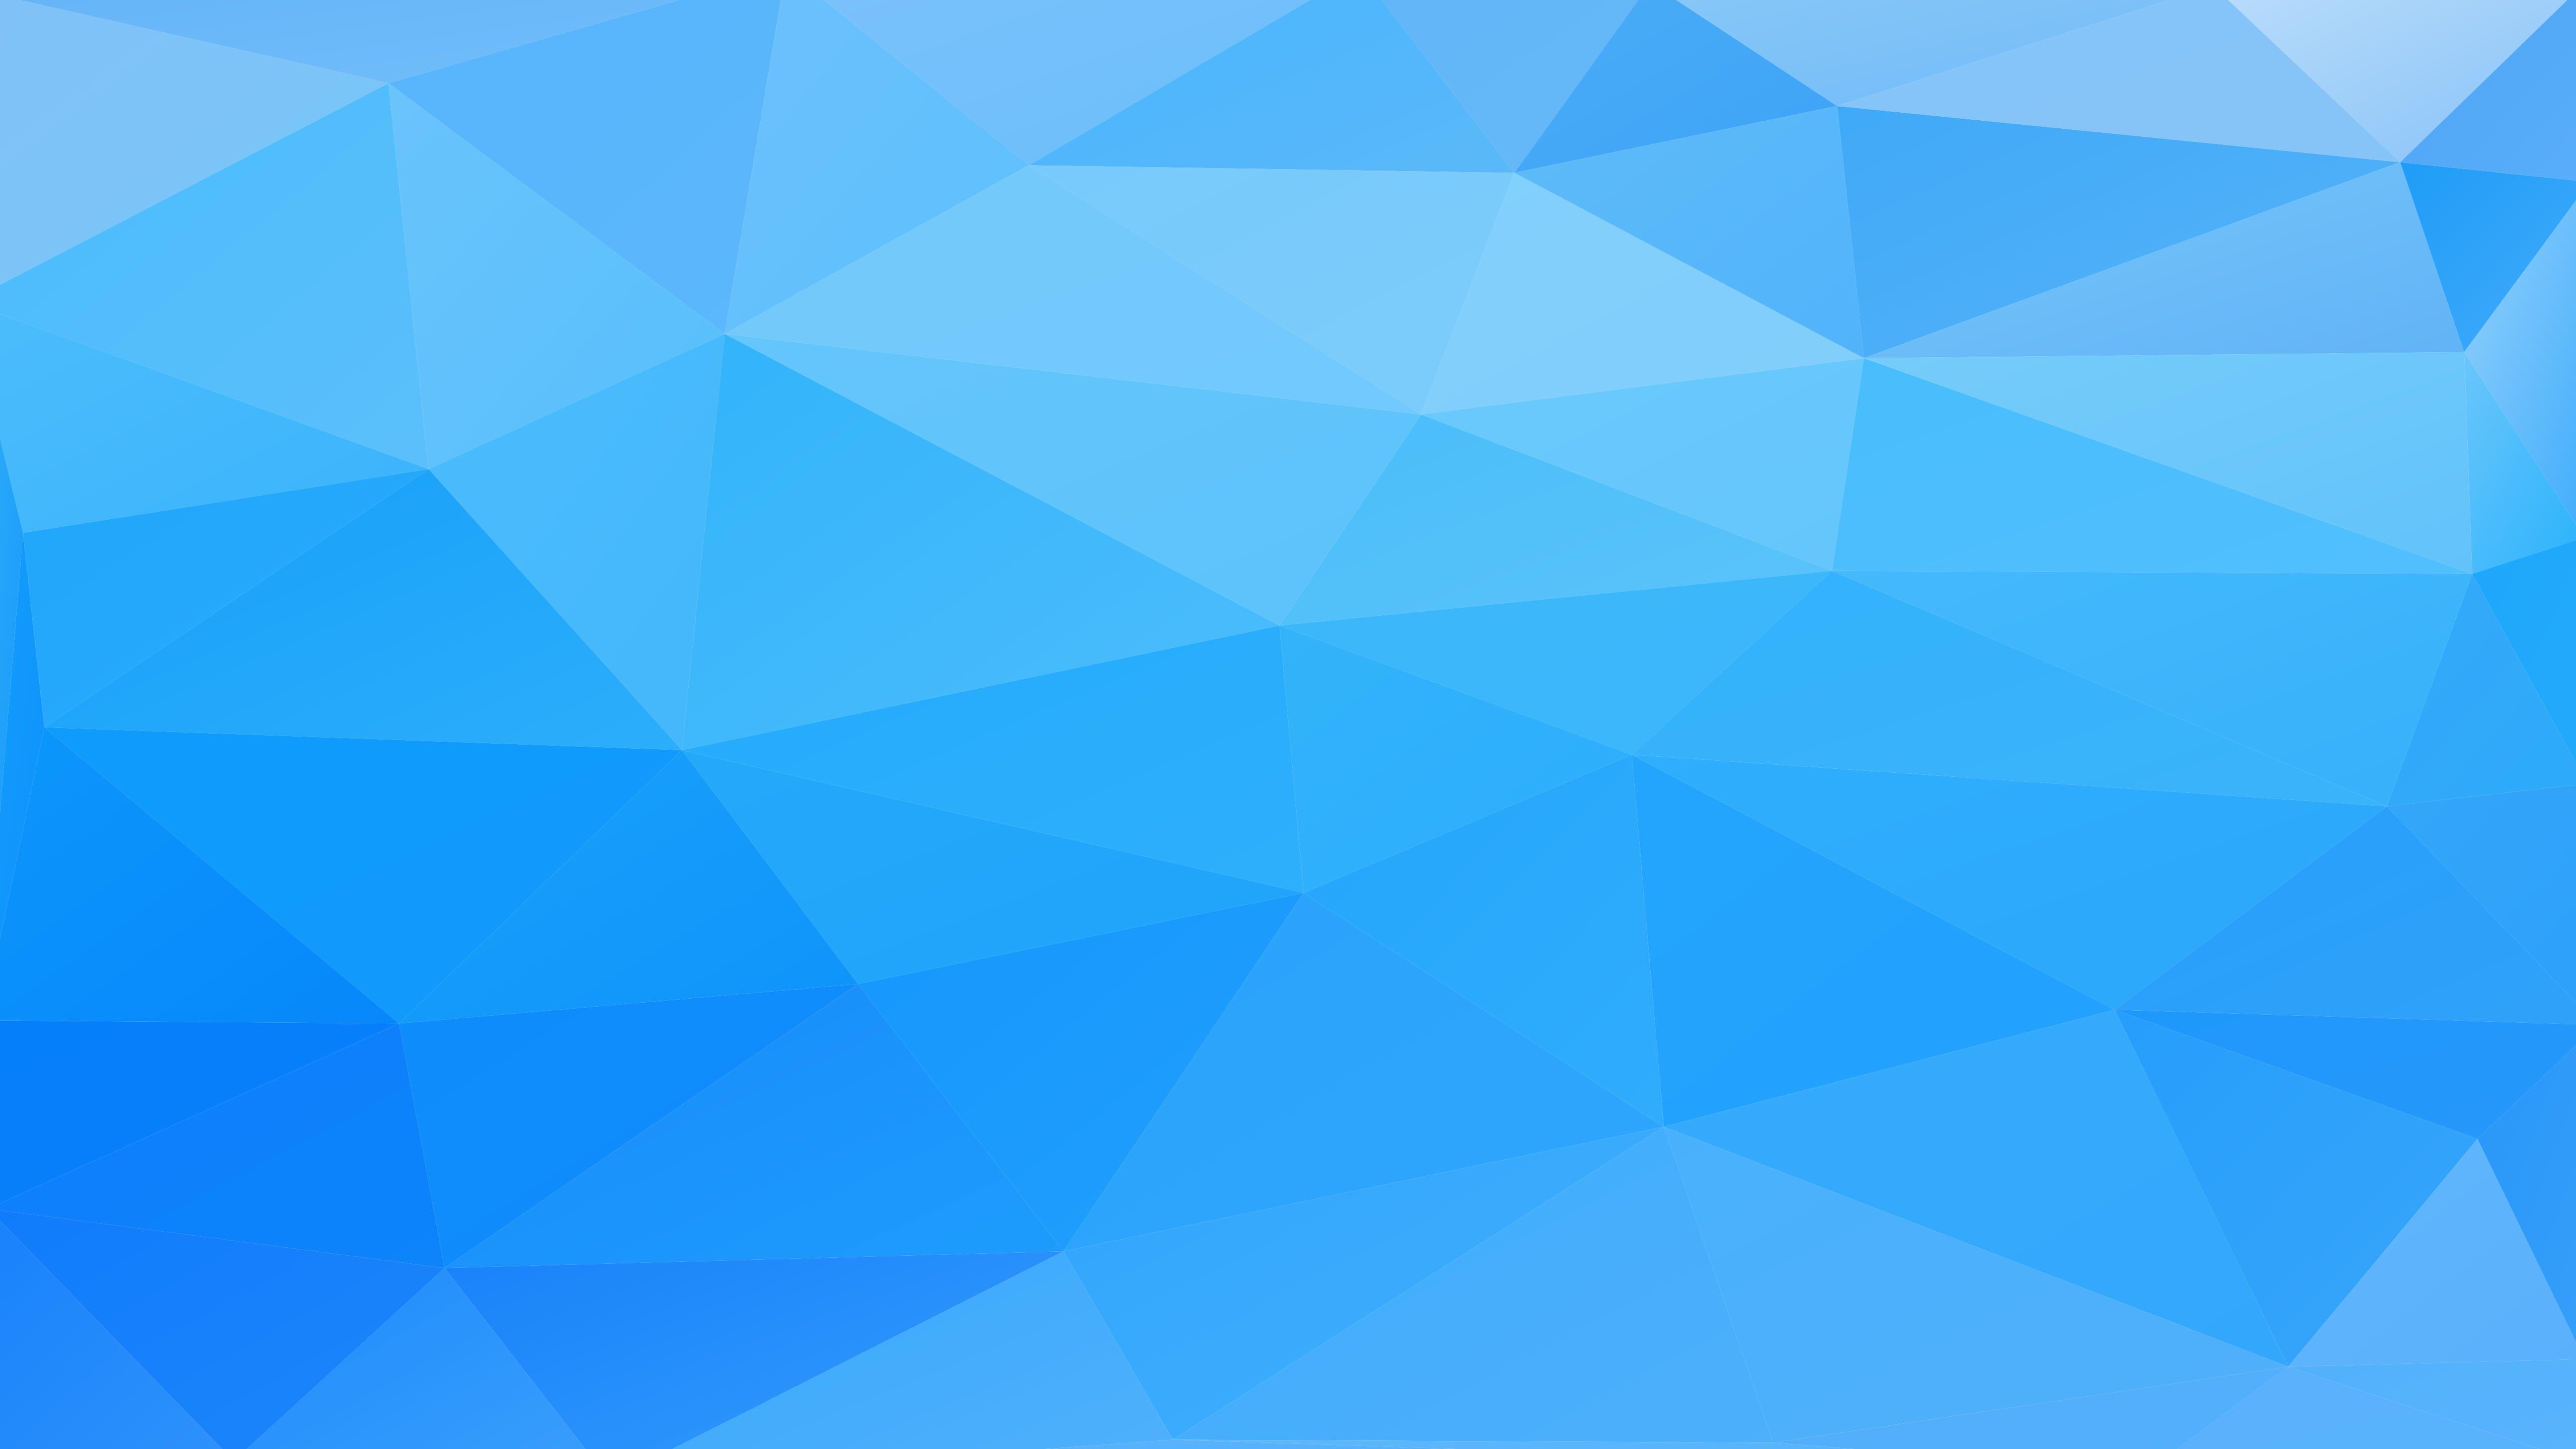 Backgrounds 3D Biru Wallpaper Cave